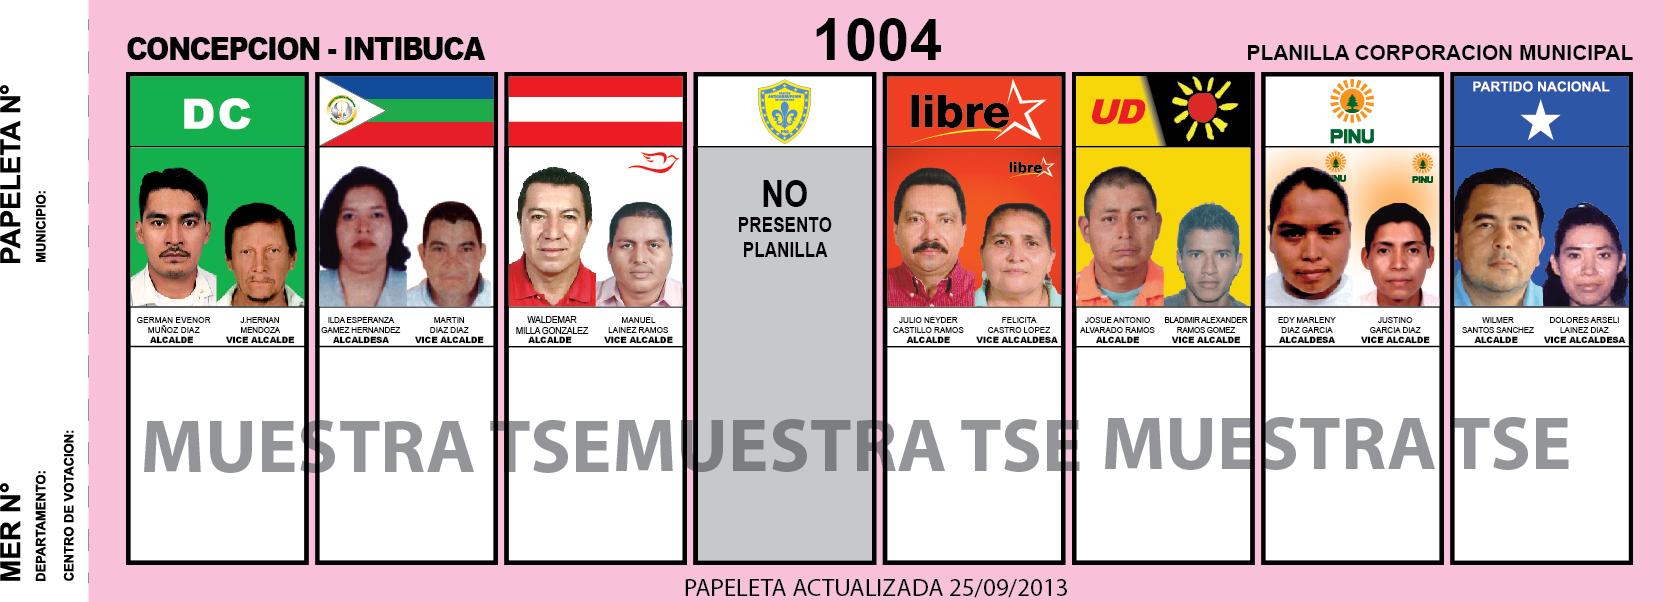 CANDIDATOS 2013 MUNICIPIO CONCEPCION - INTIBUCA - HONDURAS